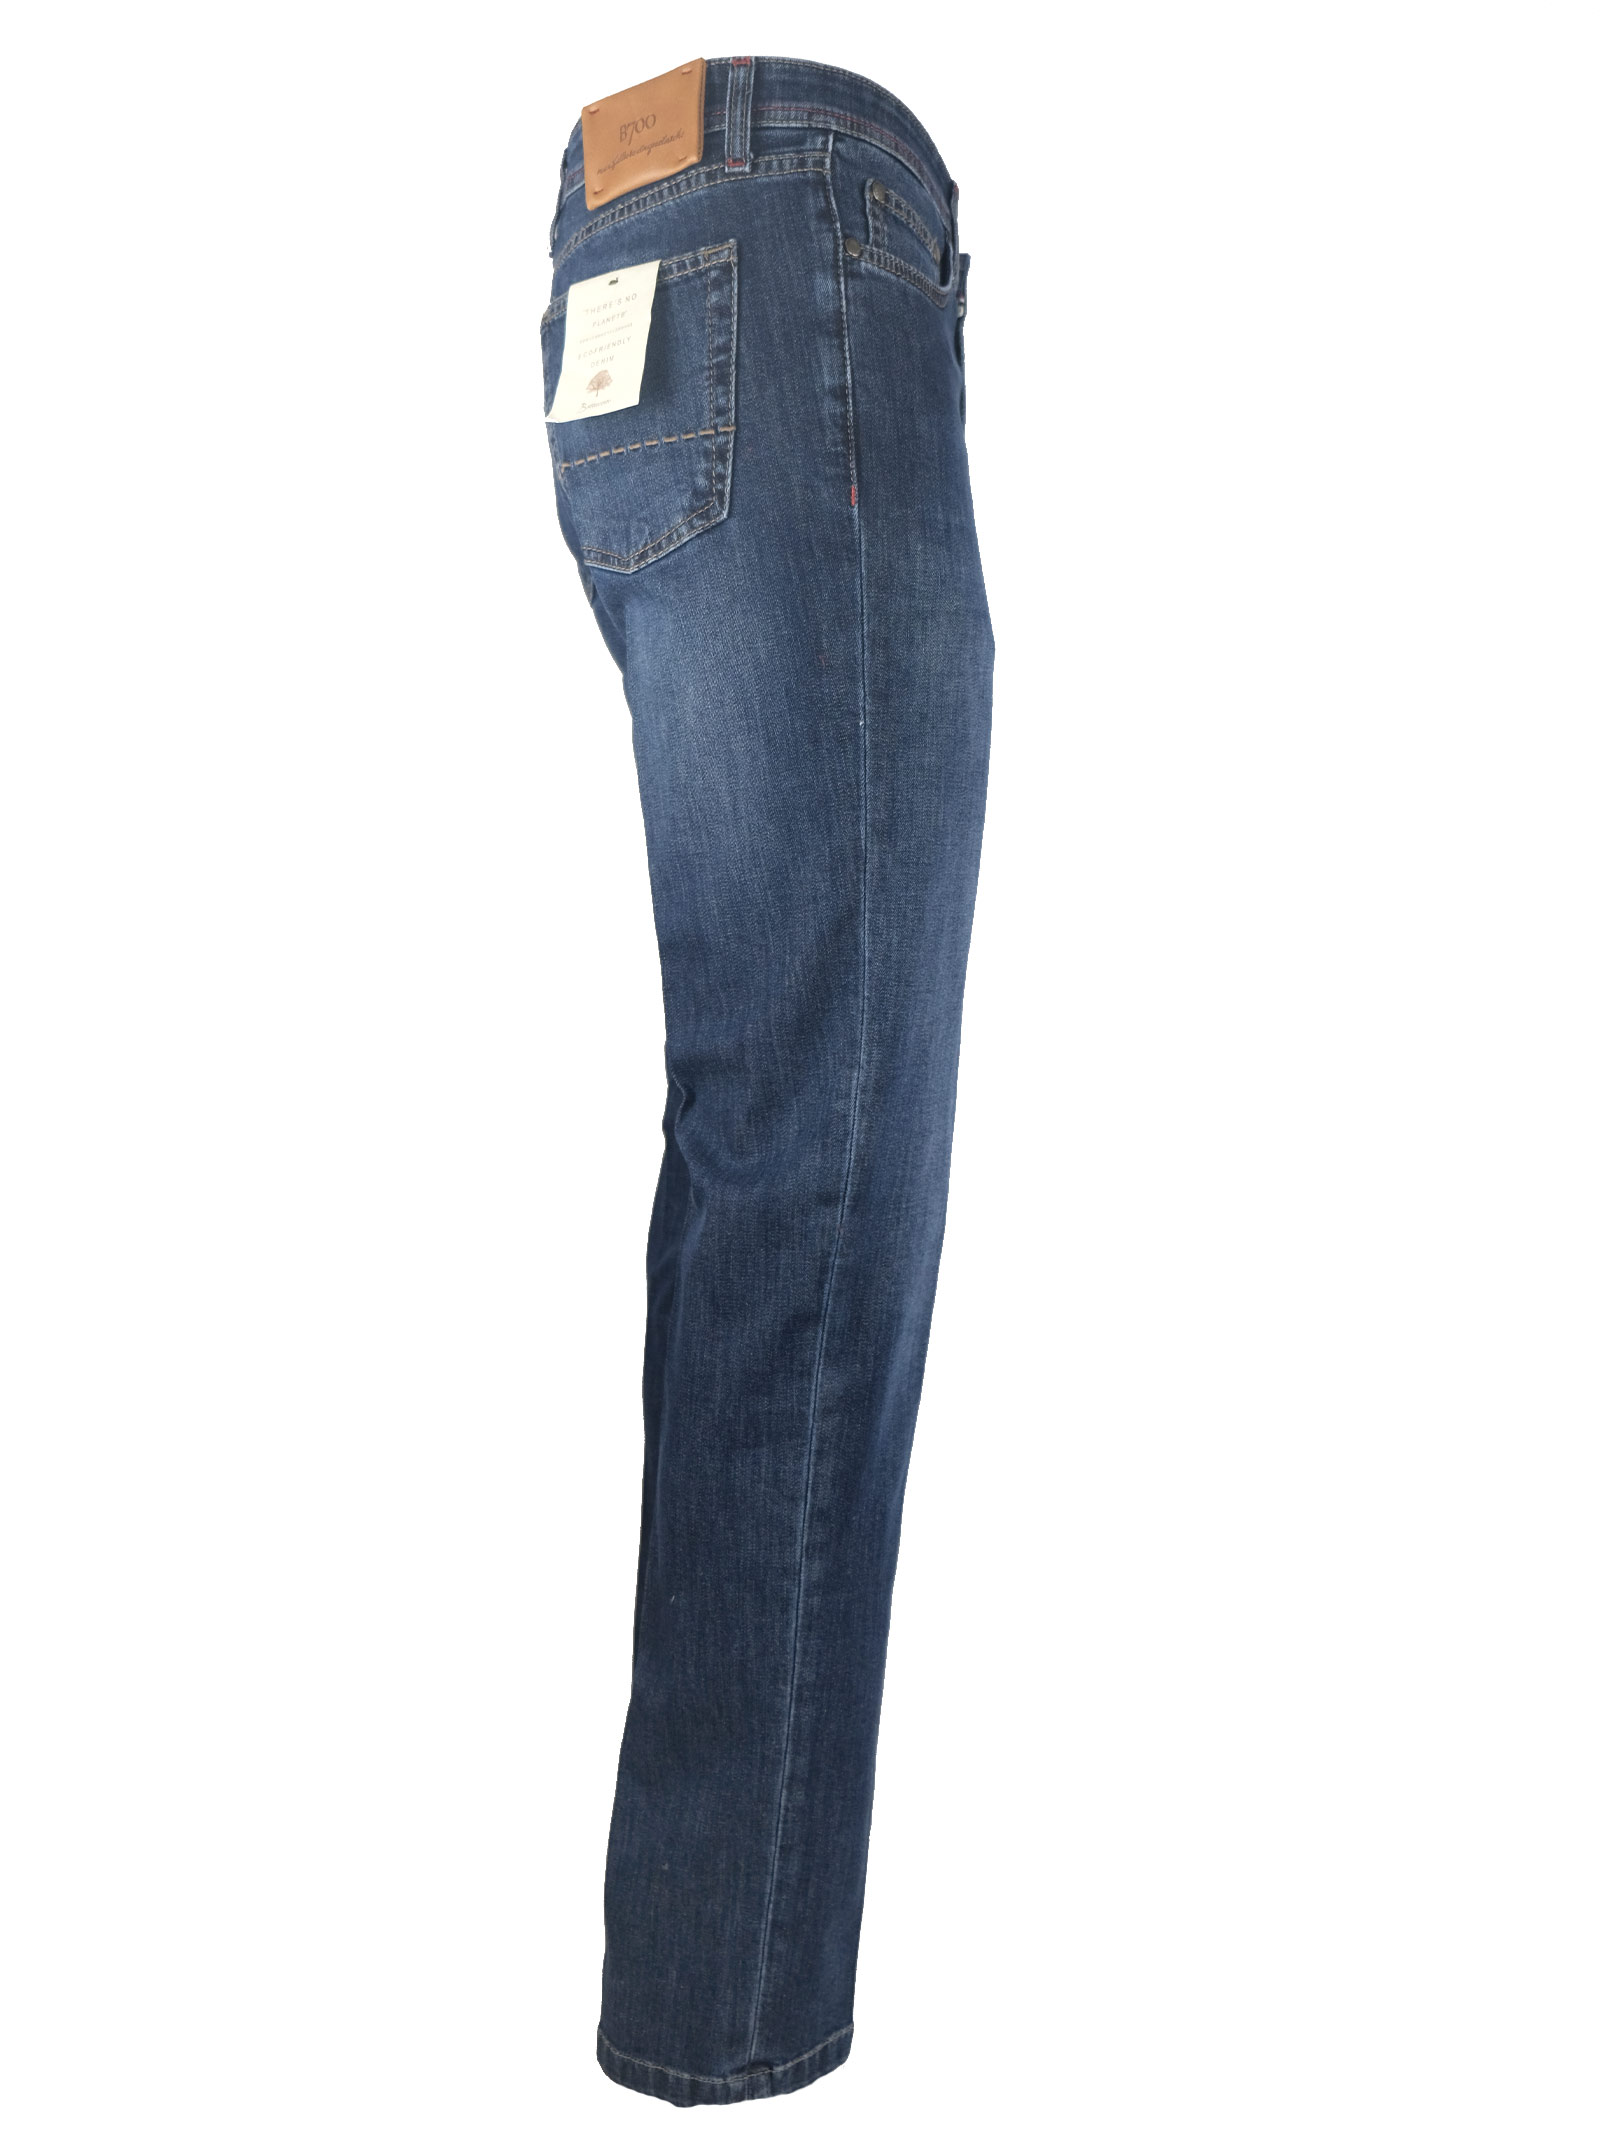 JEANS LEGGERO 8 ONCE B700   Jeans   JR704 9026109